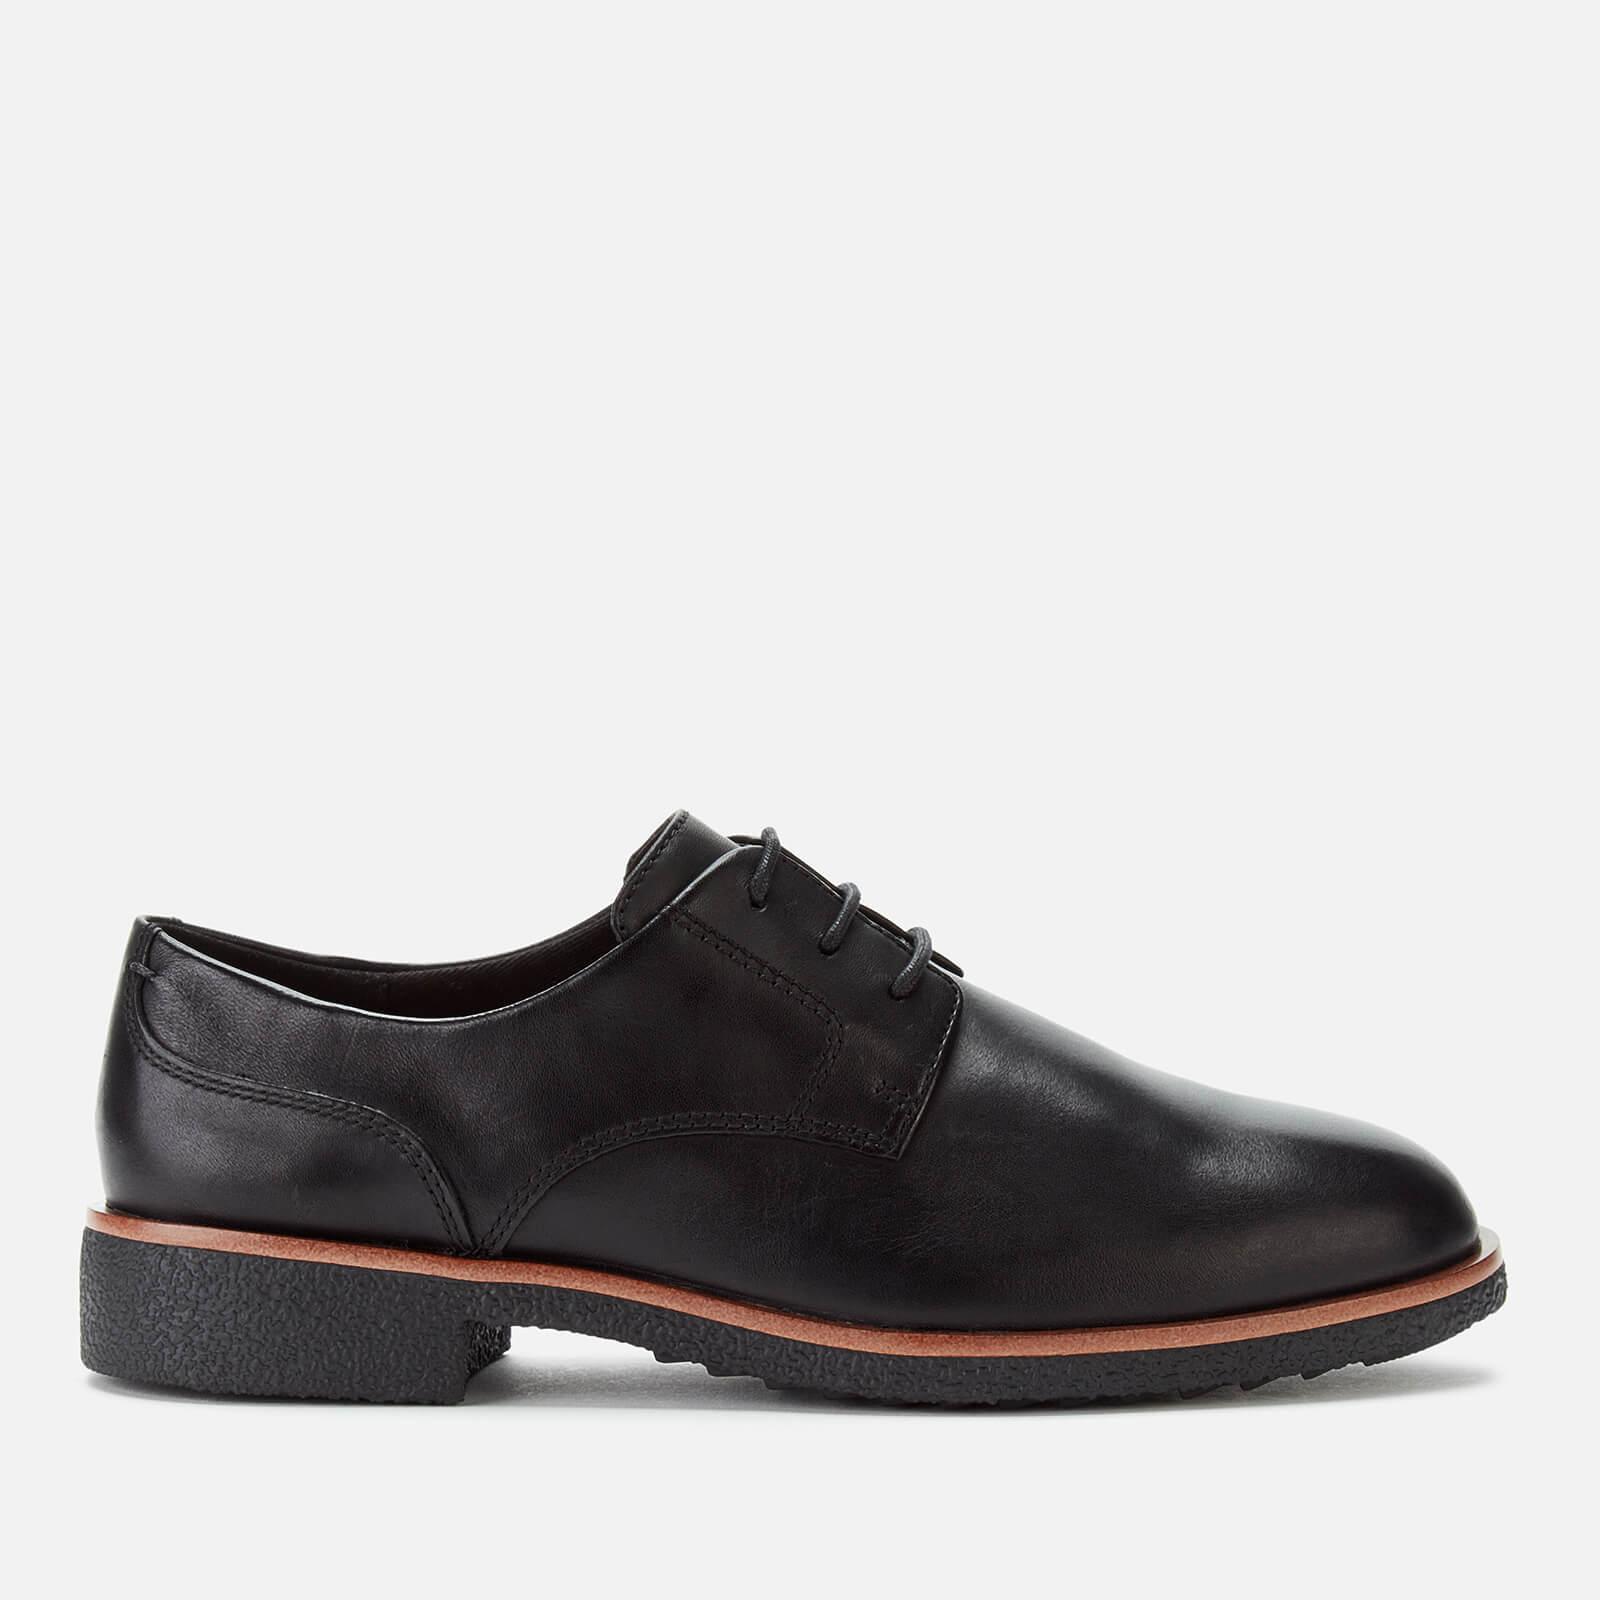 Clarks Women's Griffin Lane Leather Derby Shoes - Black - UK 3